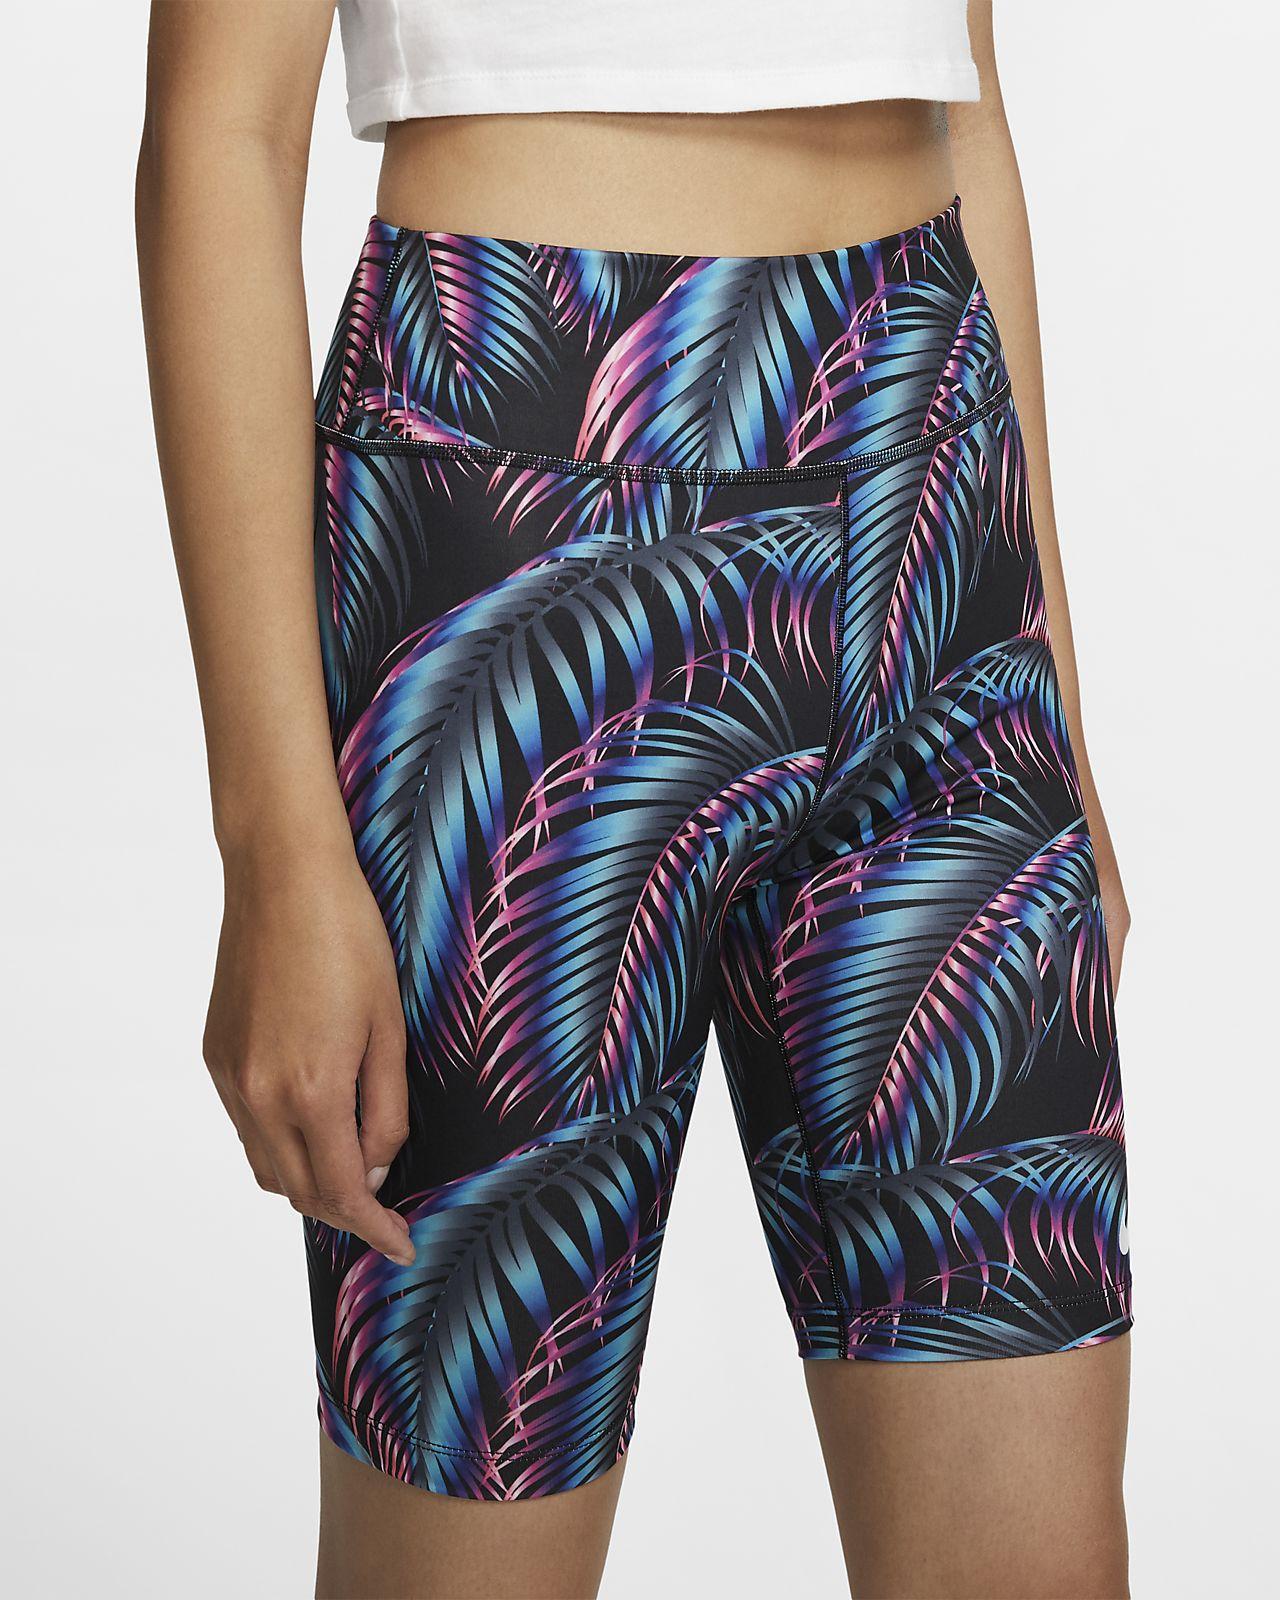 Nike Pantalons curts estampats de ciclisme - Dona